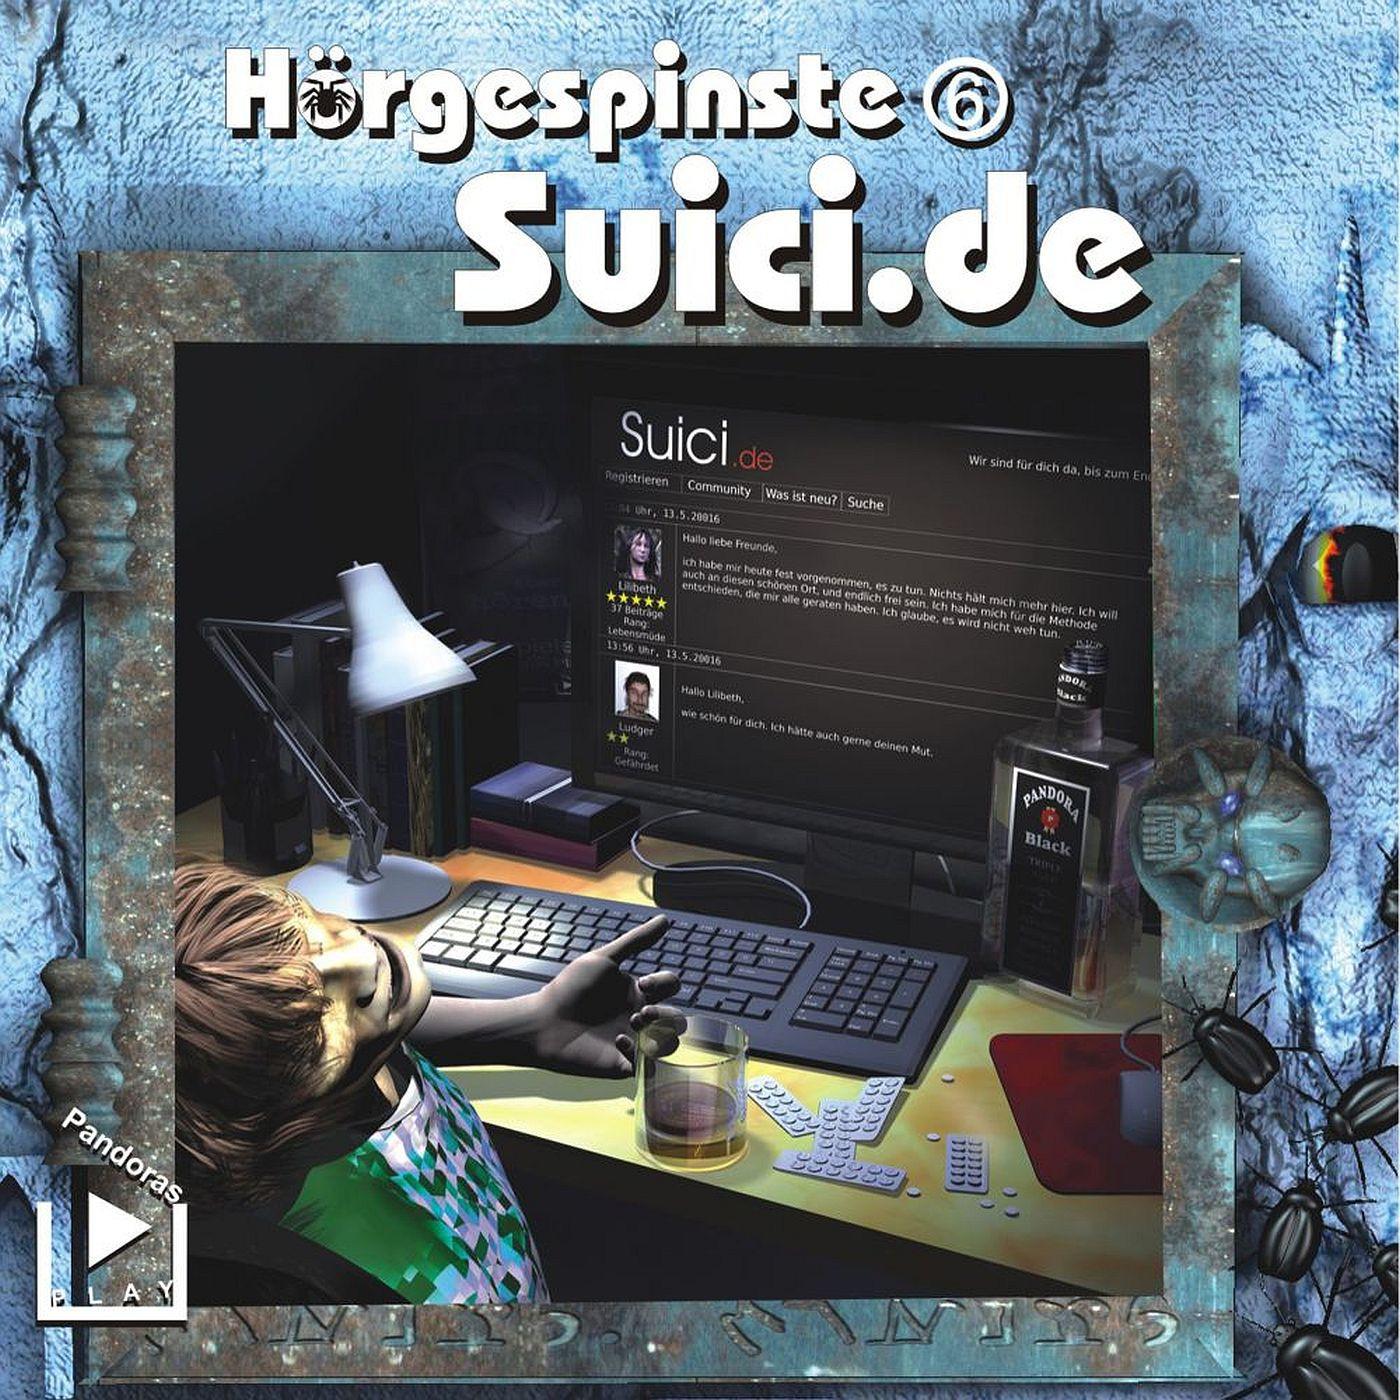 Hörgespinste (6) Suici.de - Pandoras Play 2017